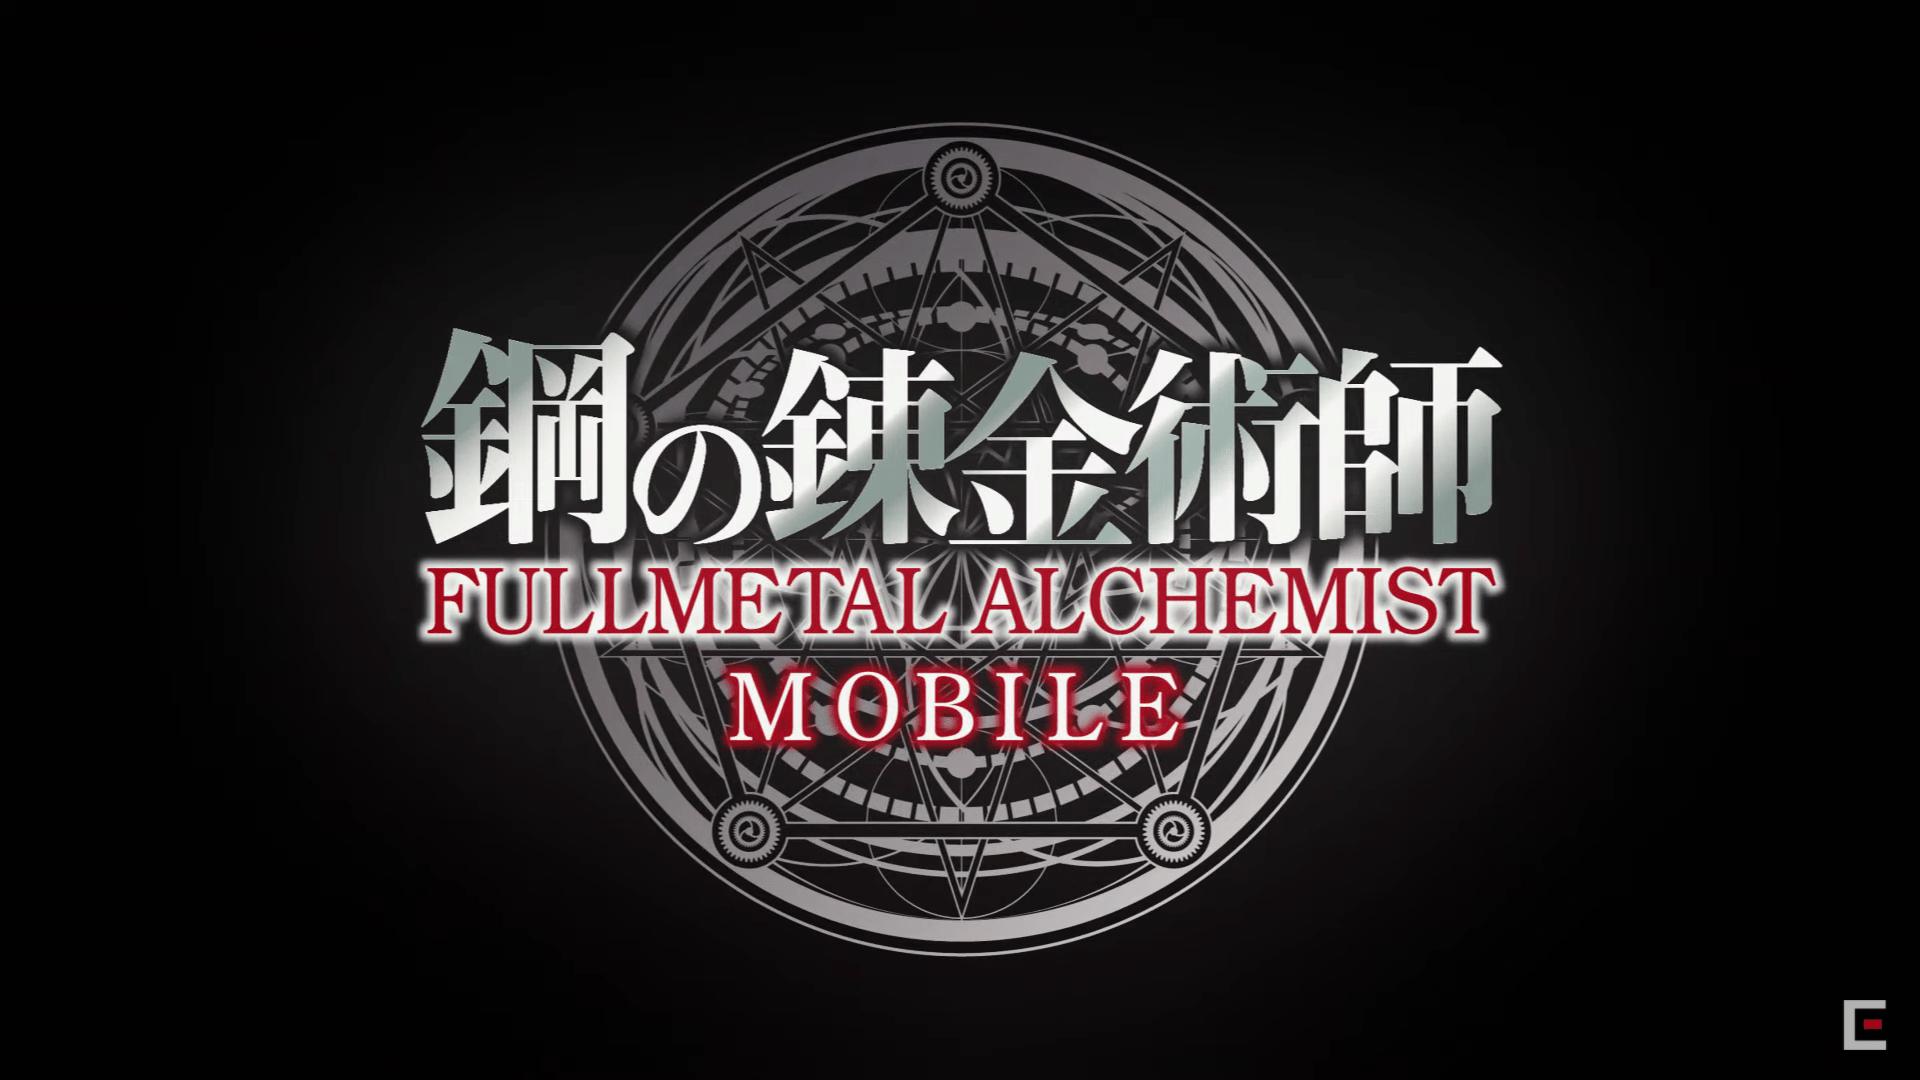 Game Mobile Fullmetal Alchemist besutan Square Enix